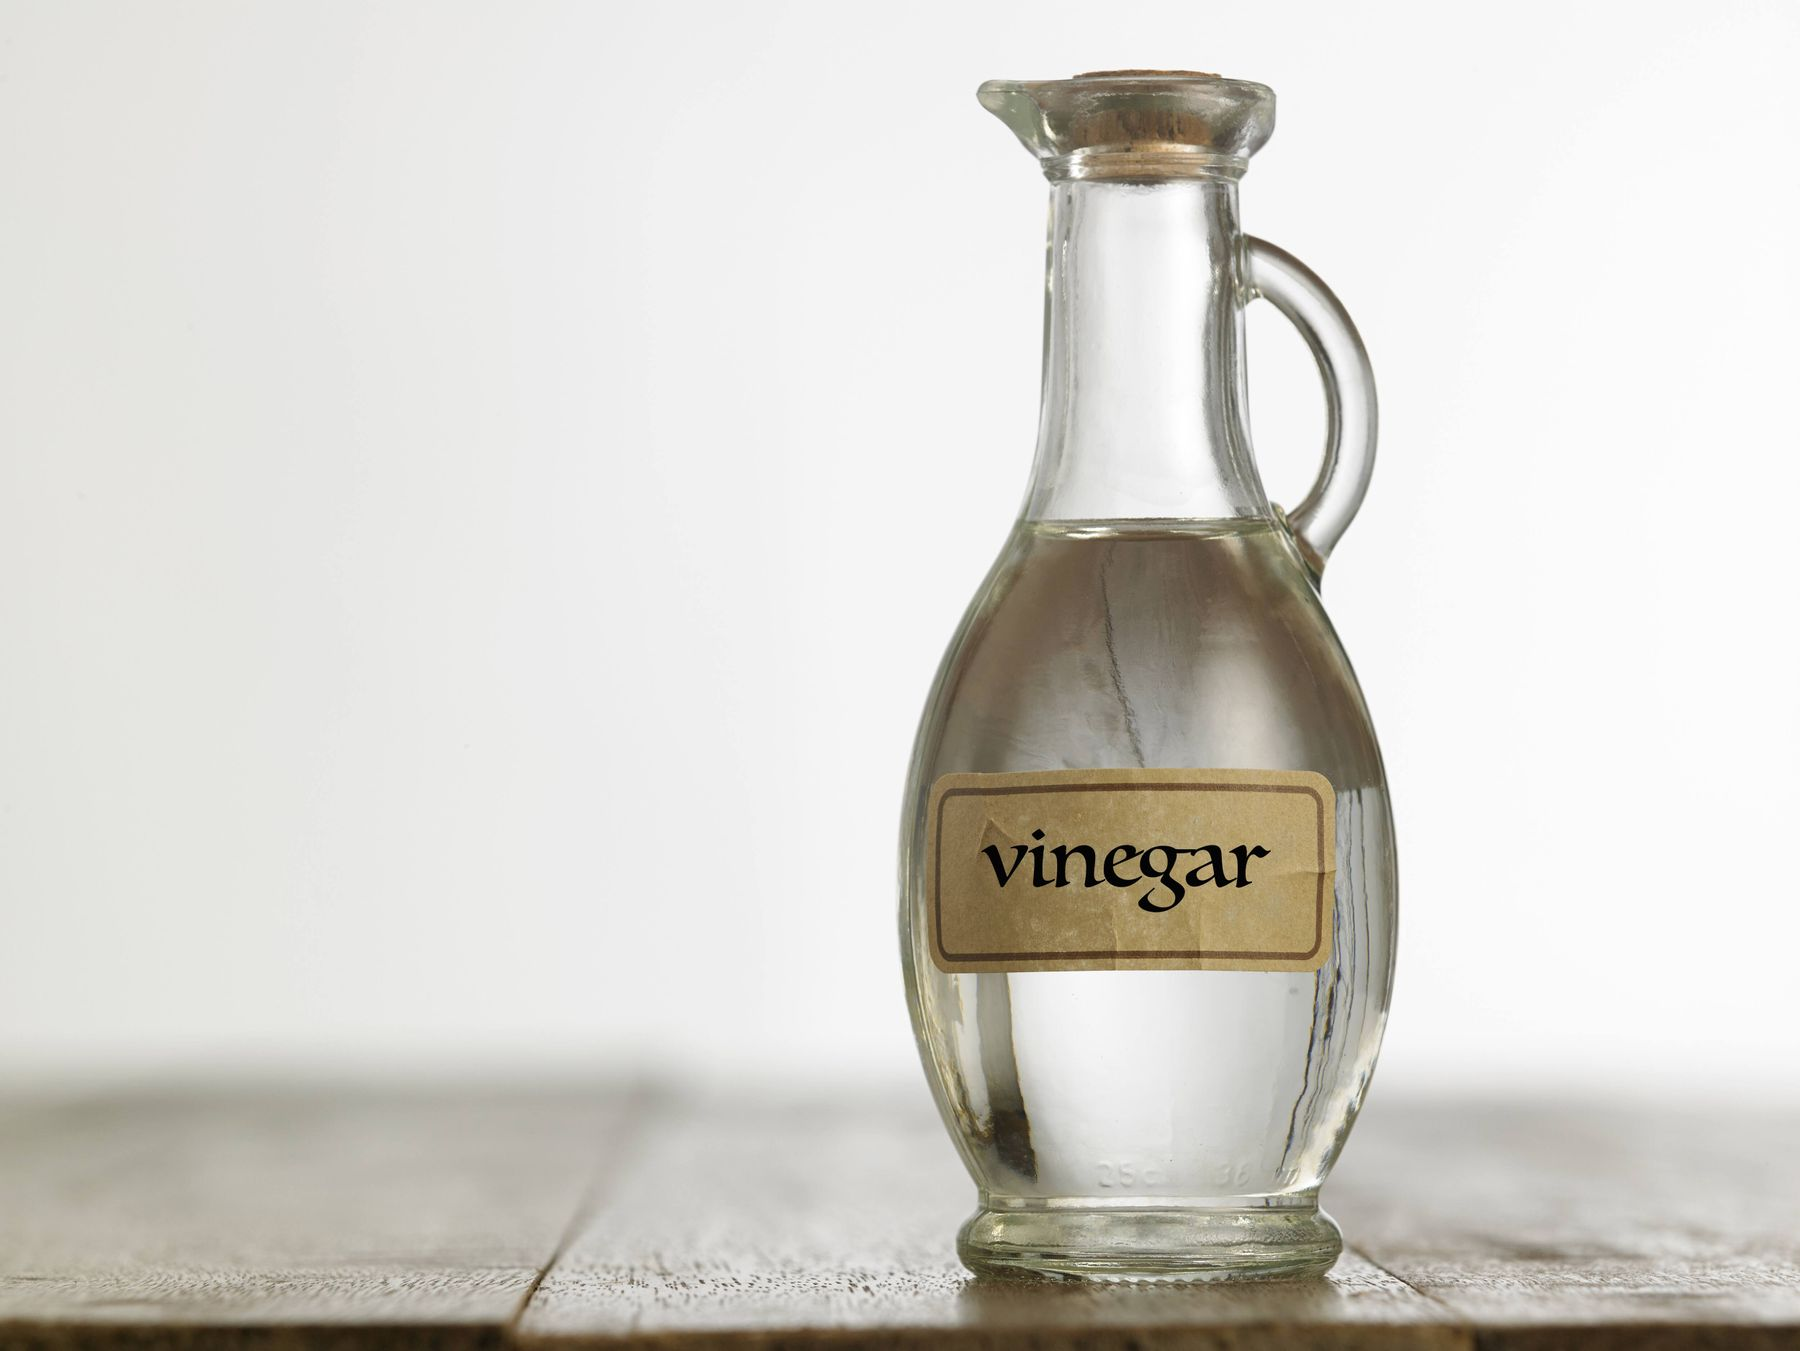 Use Vinegar on Bathroom Walls